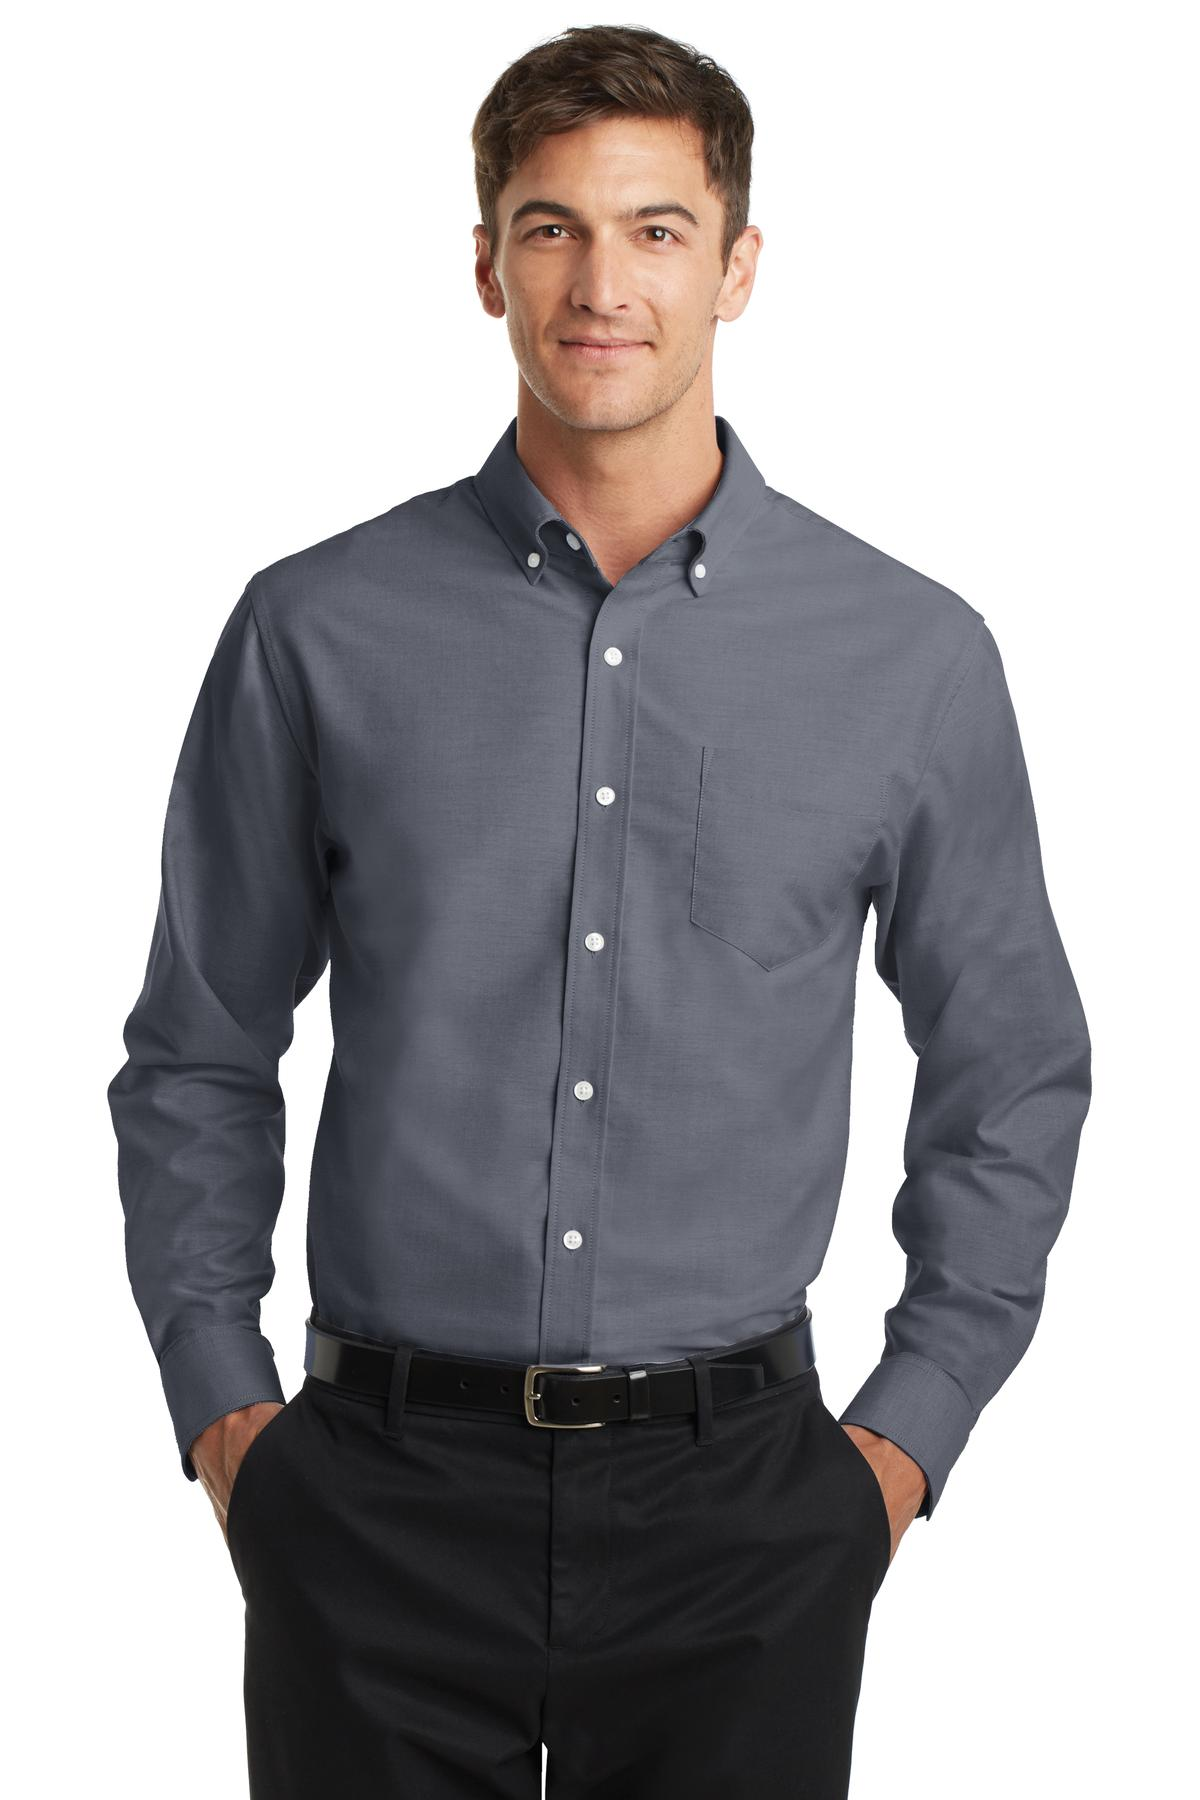 port authority® s658 - superpro oxford shirt ayoygda